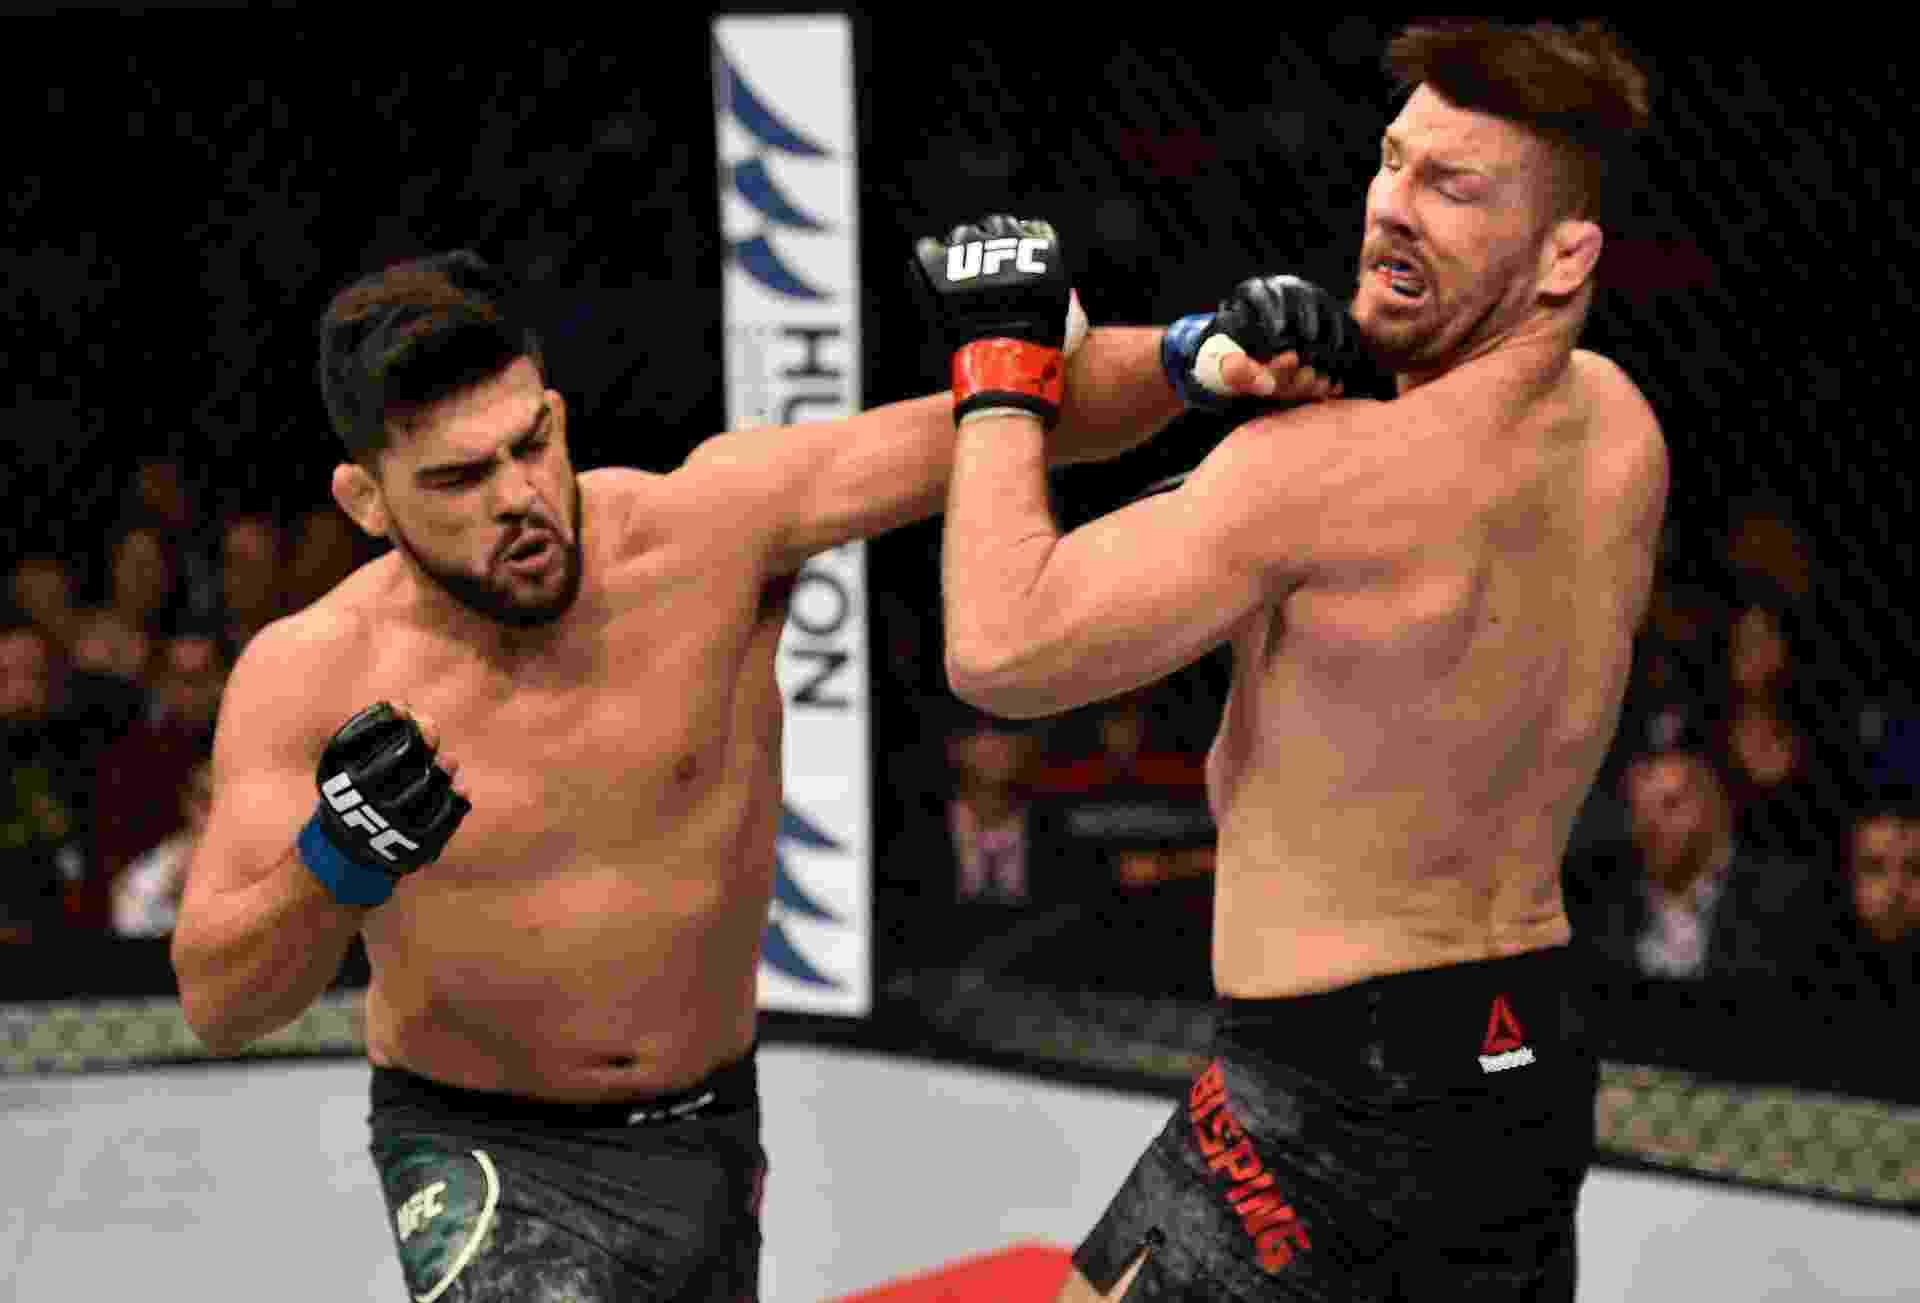 Na luta principal do UFC Fight Night em Xangai, na China, Kelvin Gastelum nocauteou Michael Bisping no primeiro round - Brandon Magnus/Zuffa LLC via Getty Images